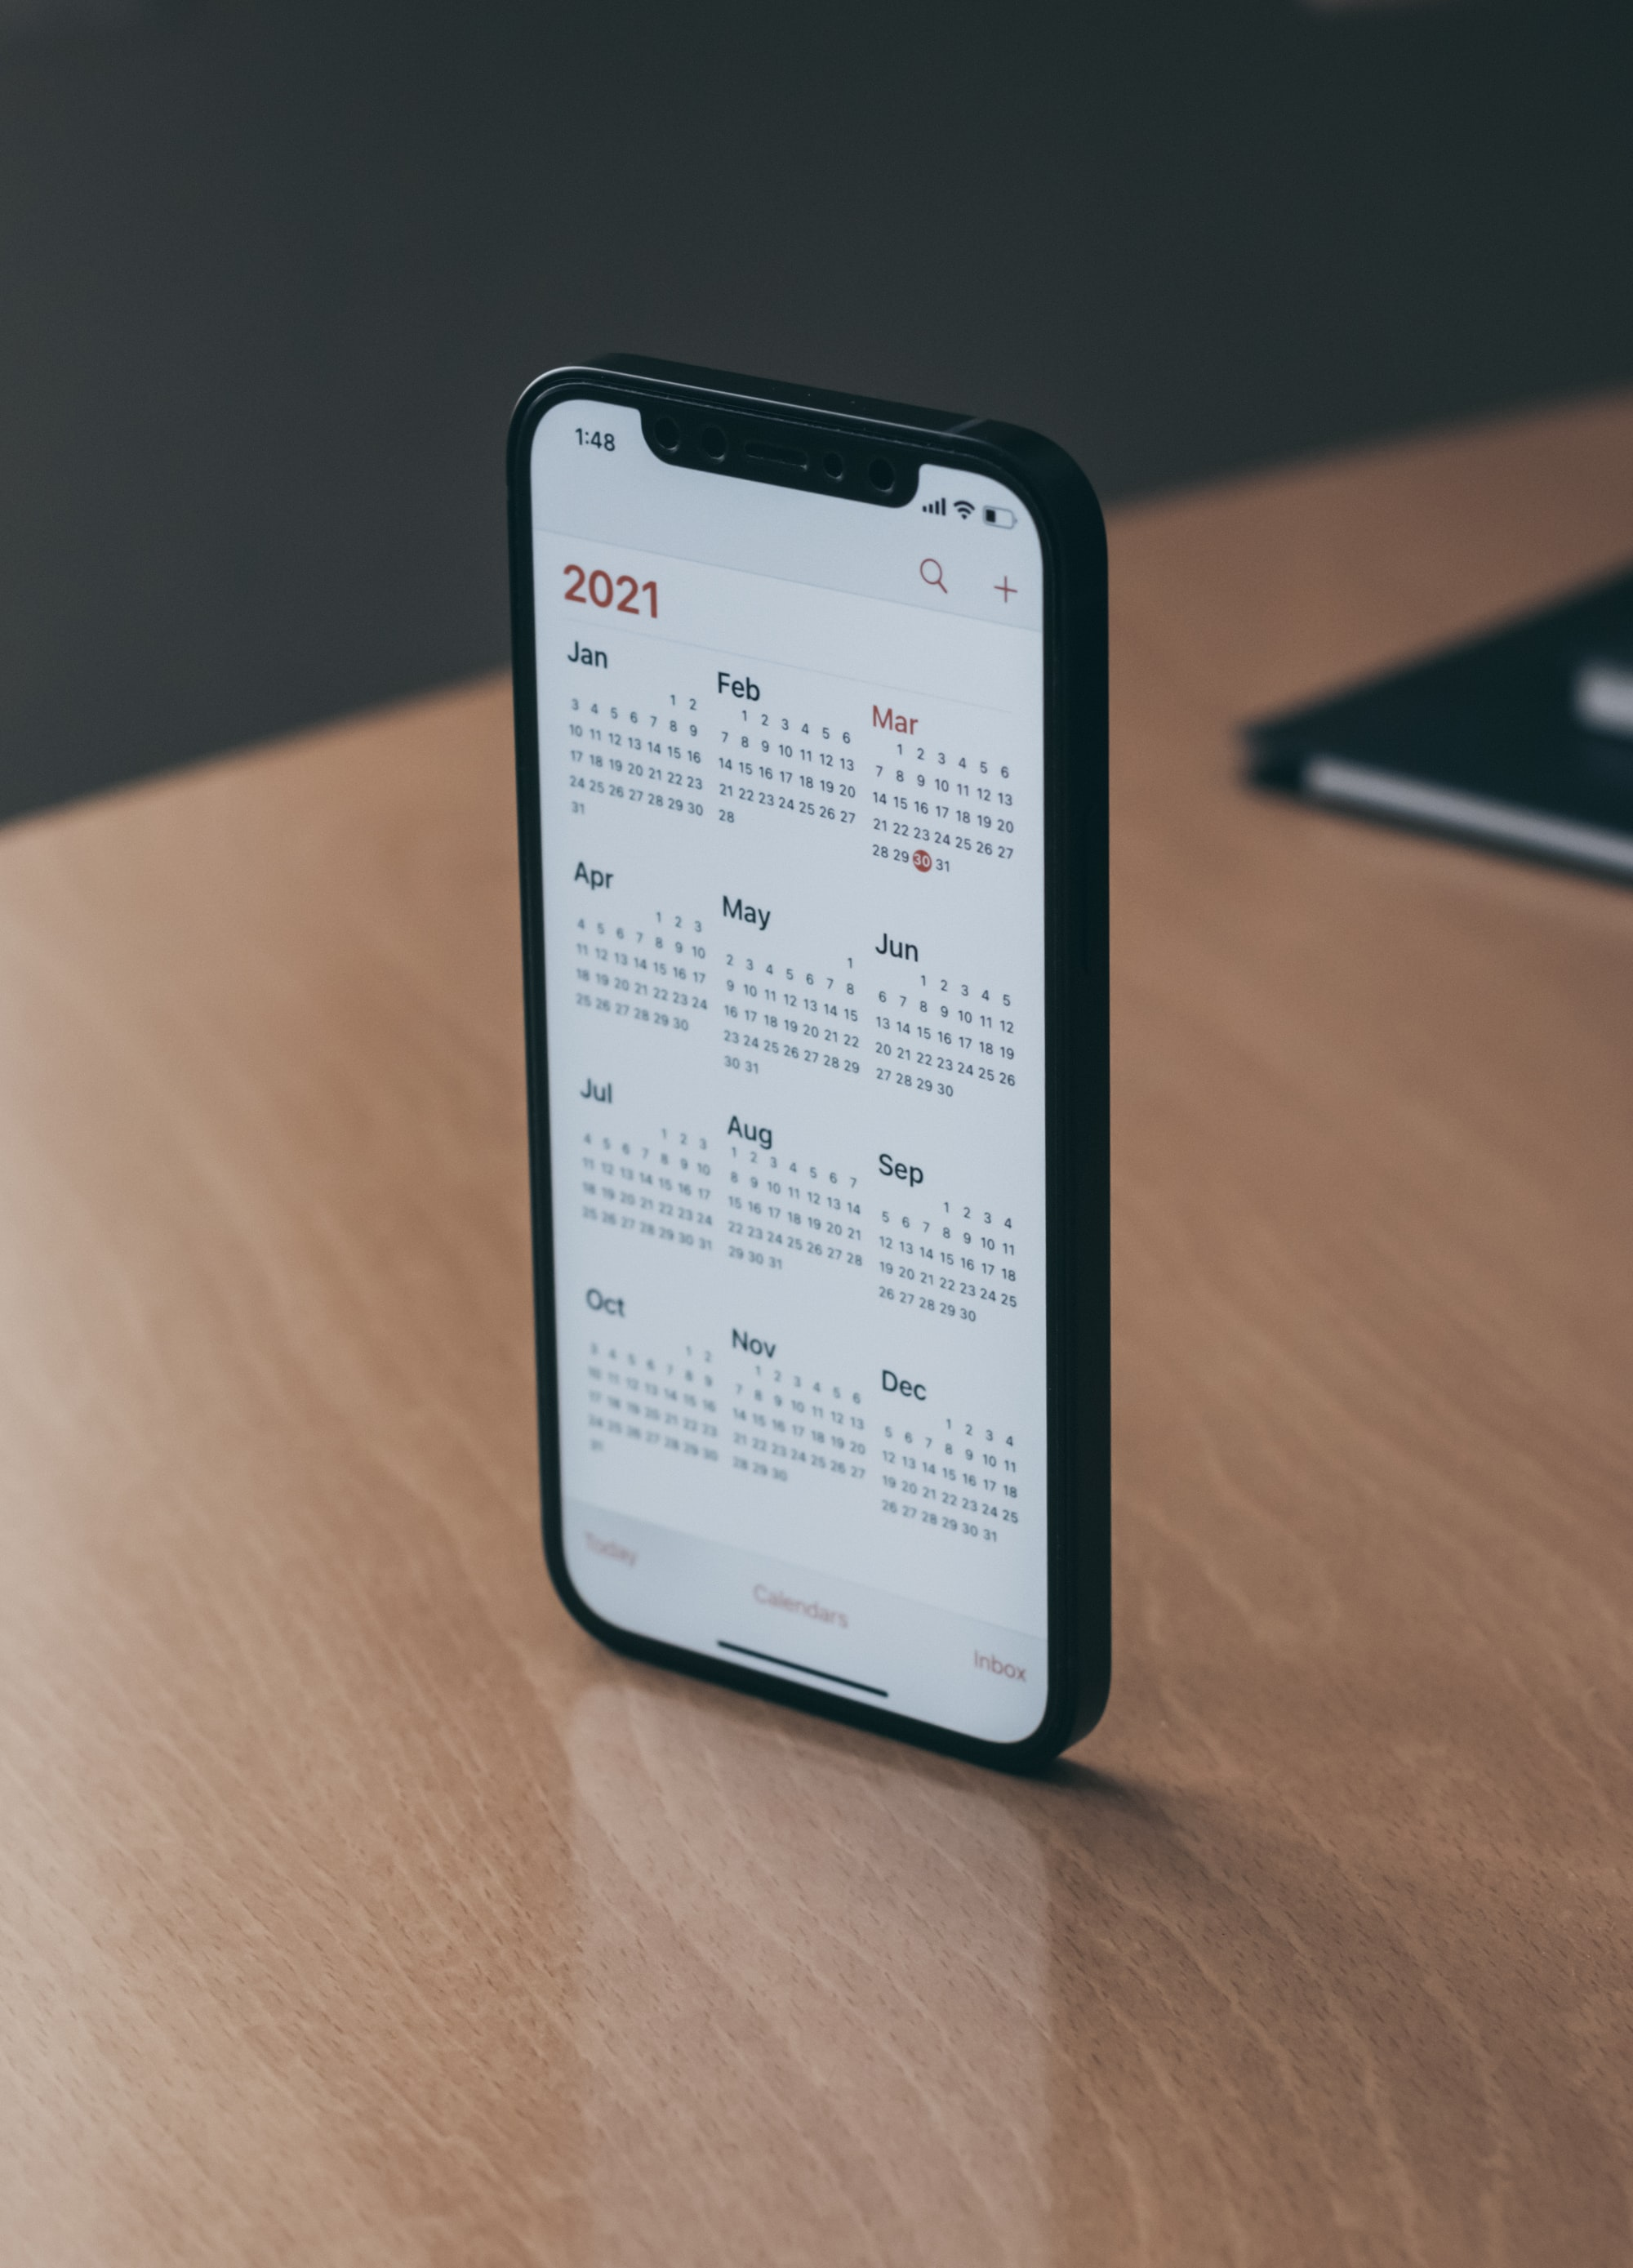 100 Days of DevOps